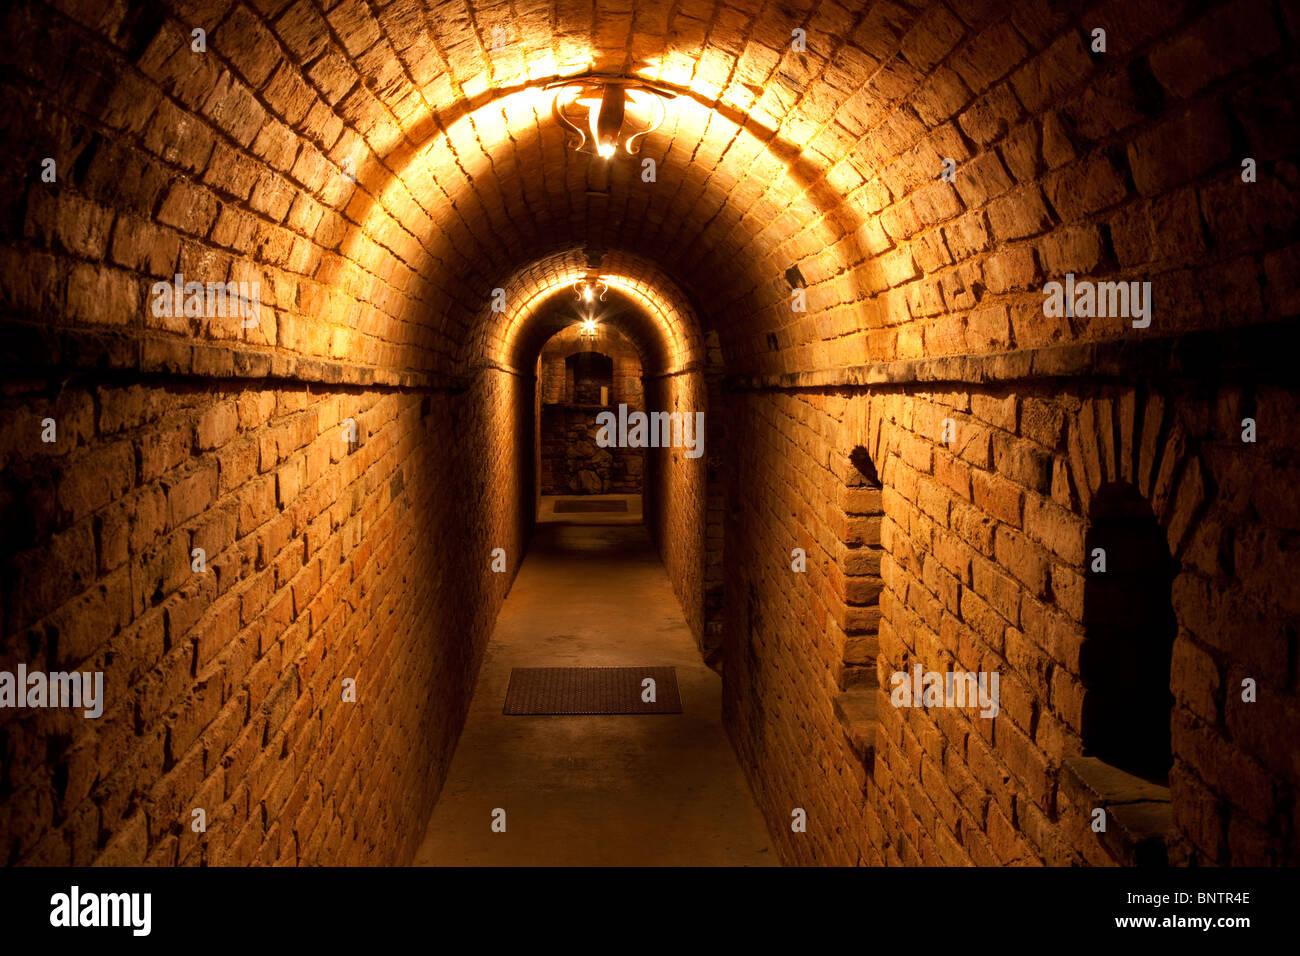 Dark hallway at Castello di Amorosa. Napa Valley, California. Property released - Stock Image